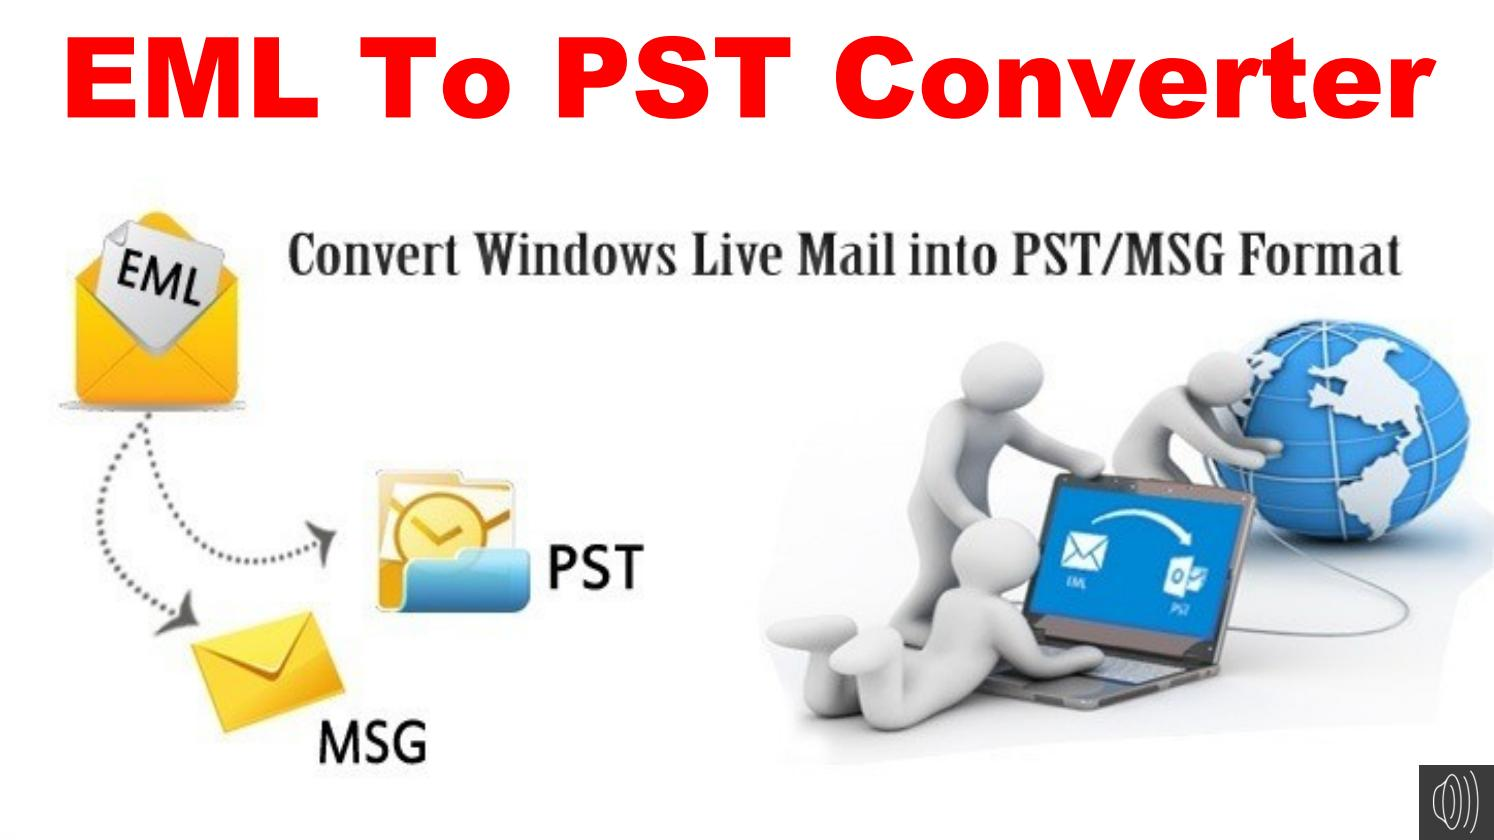 EML to PST Converter Software by xavierbrad - issuu